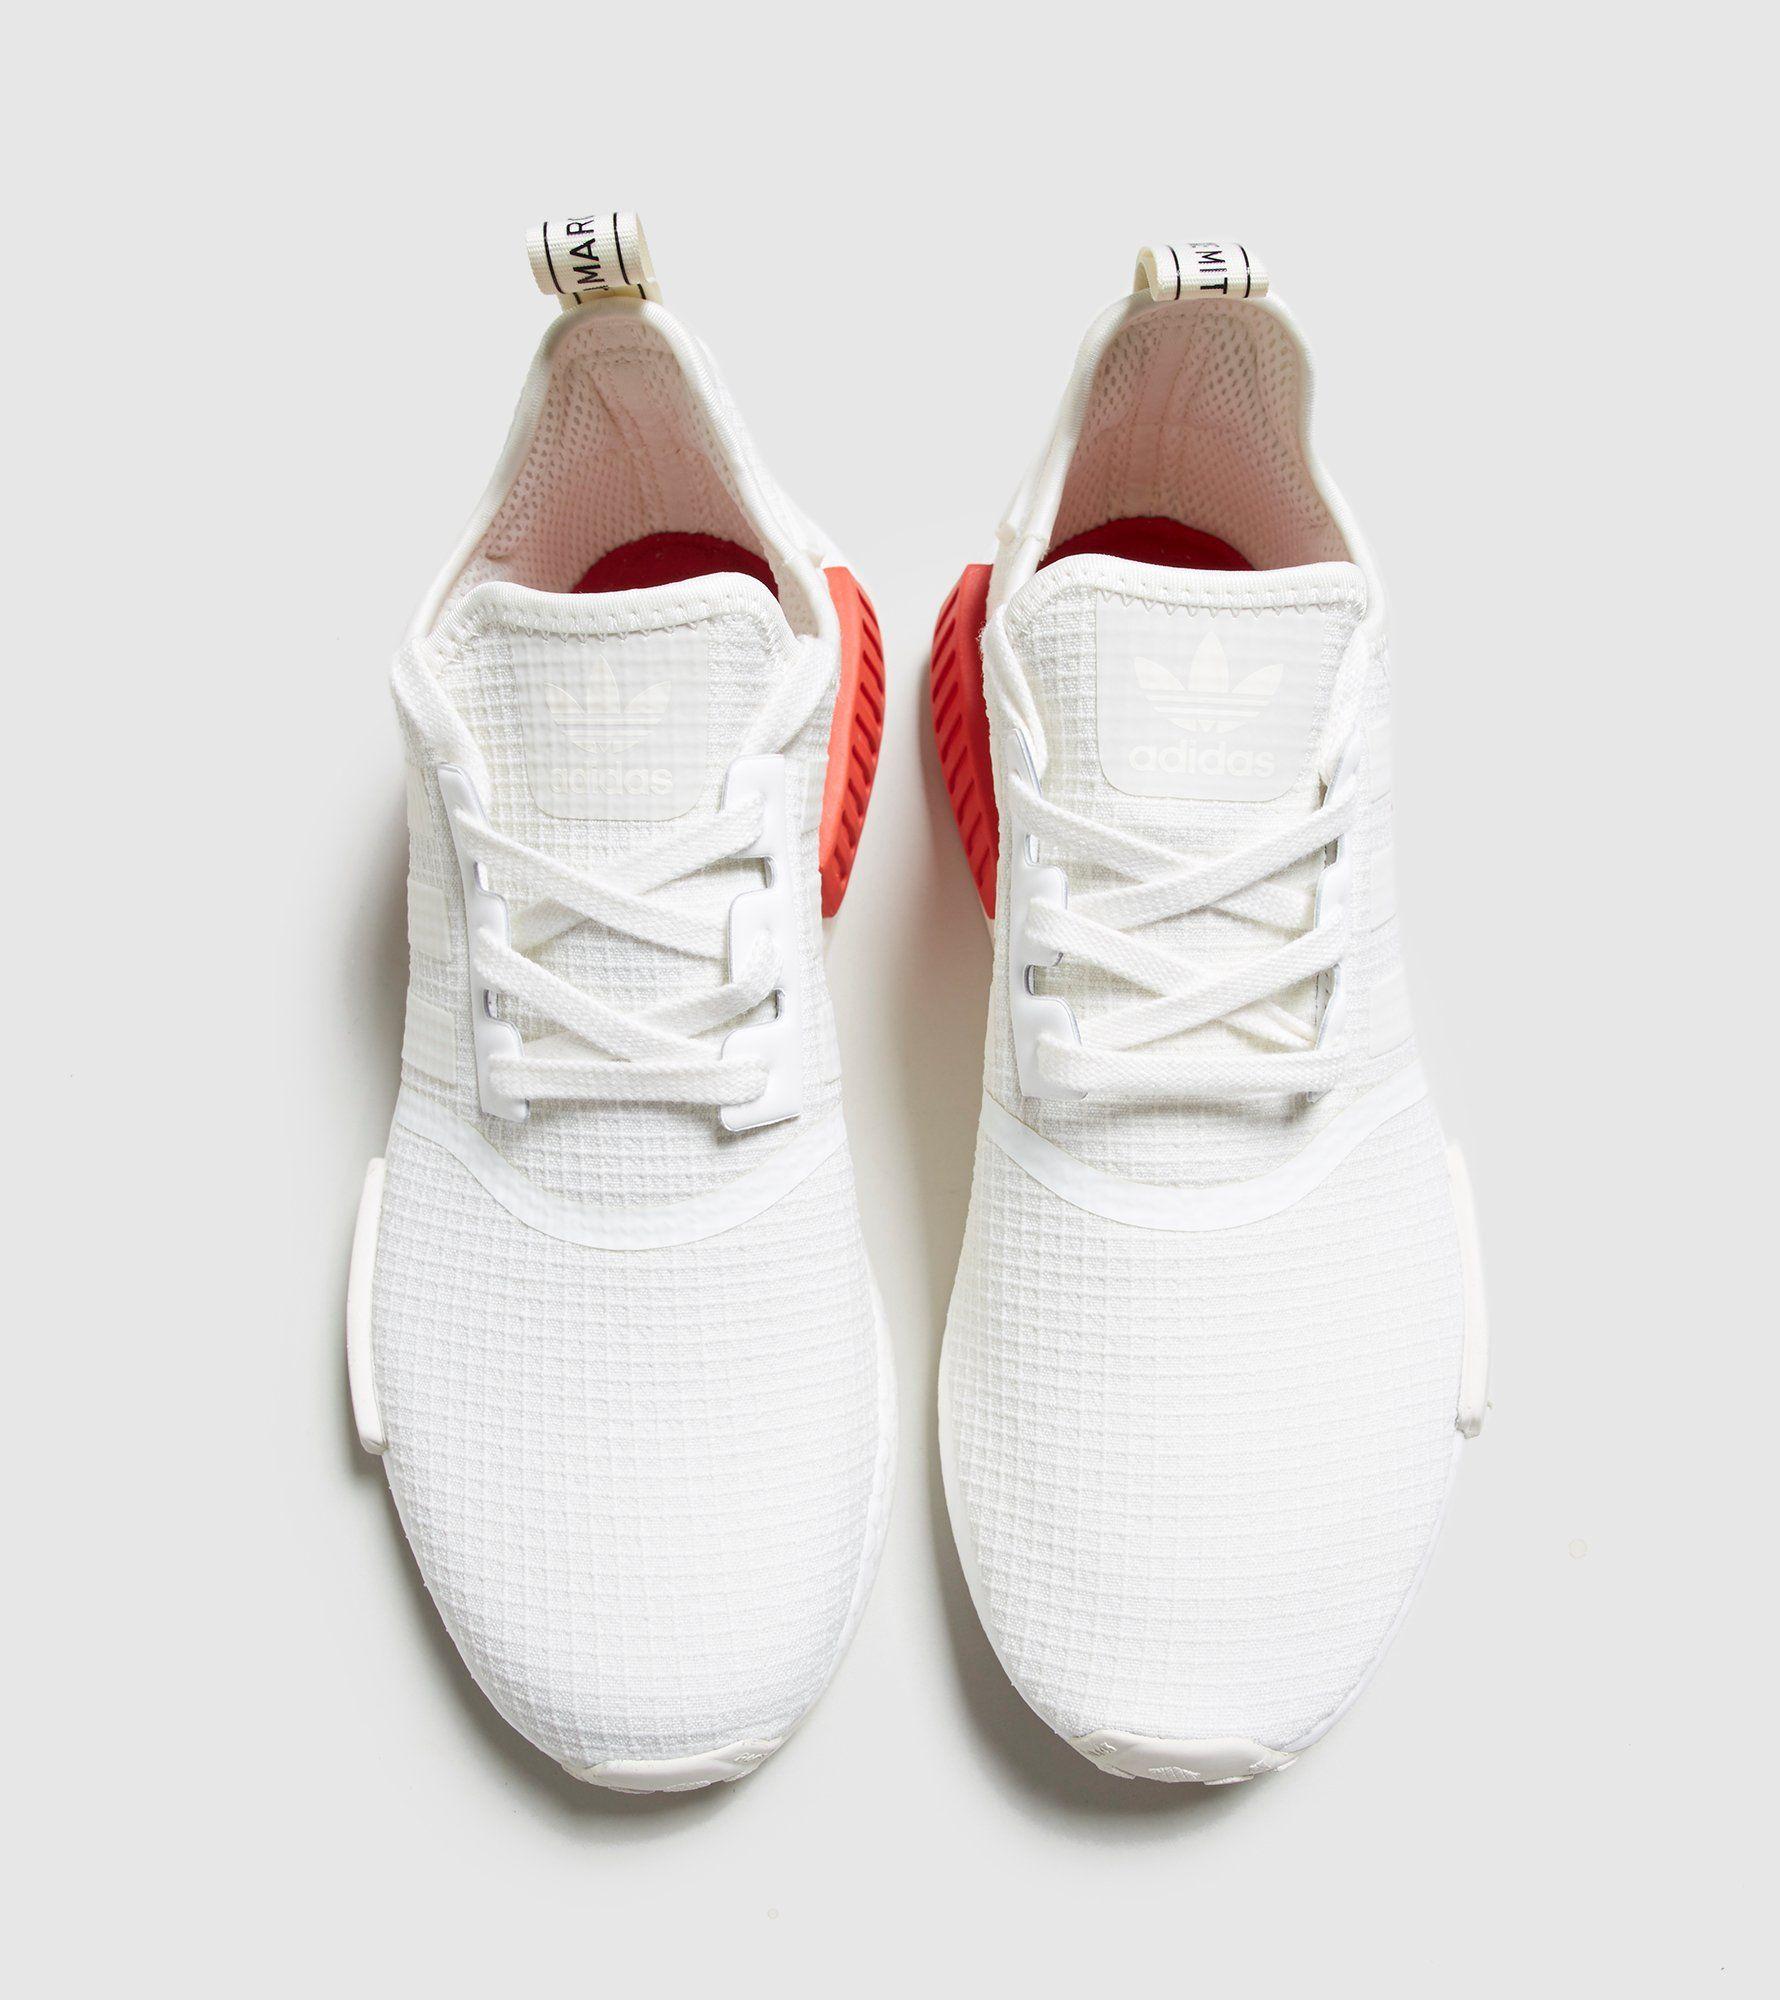 adidas Originals NMD R1 Ripstop